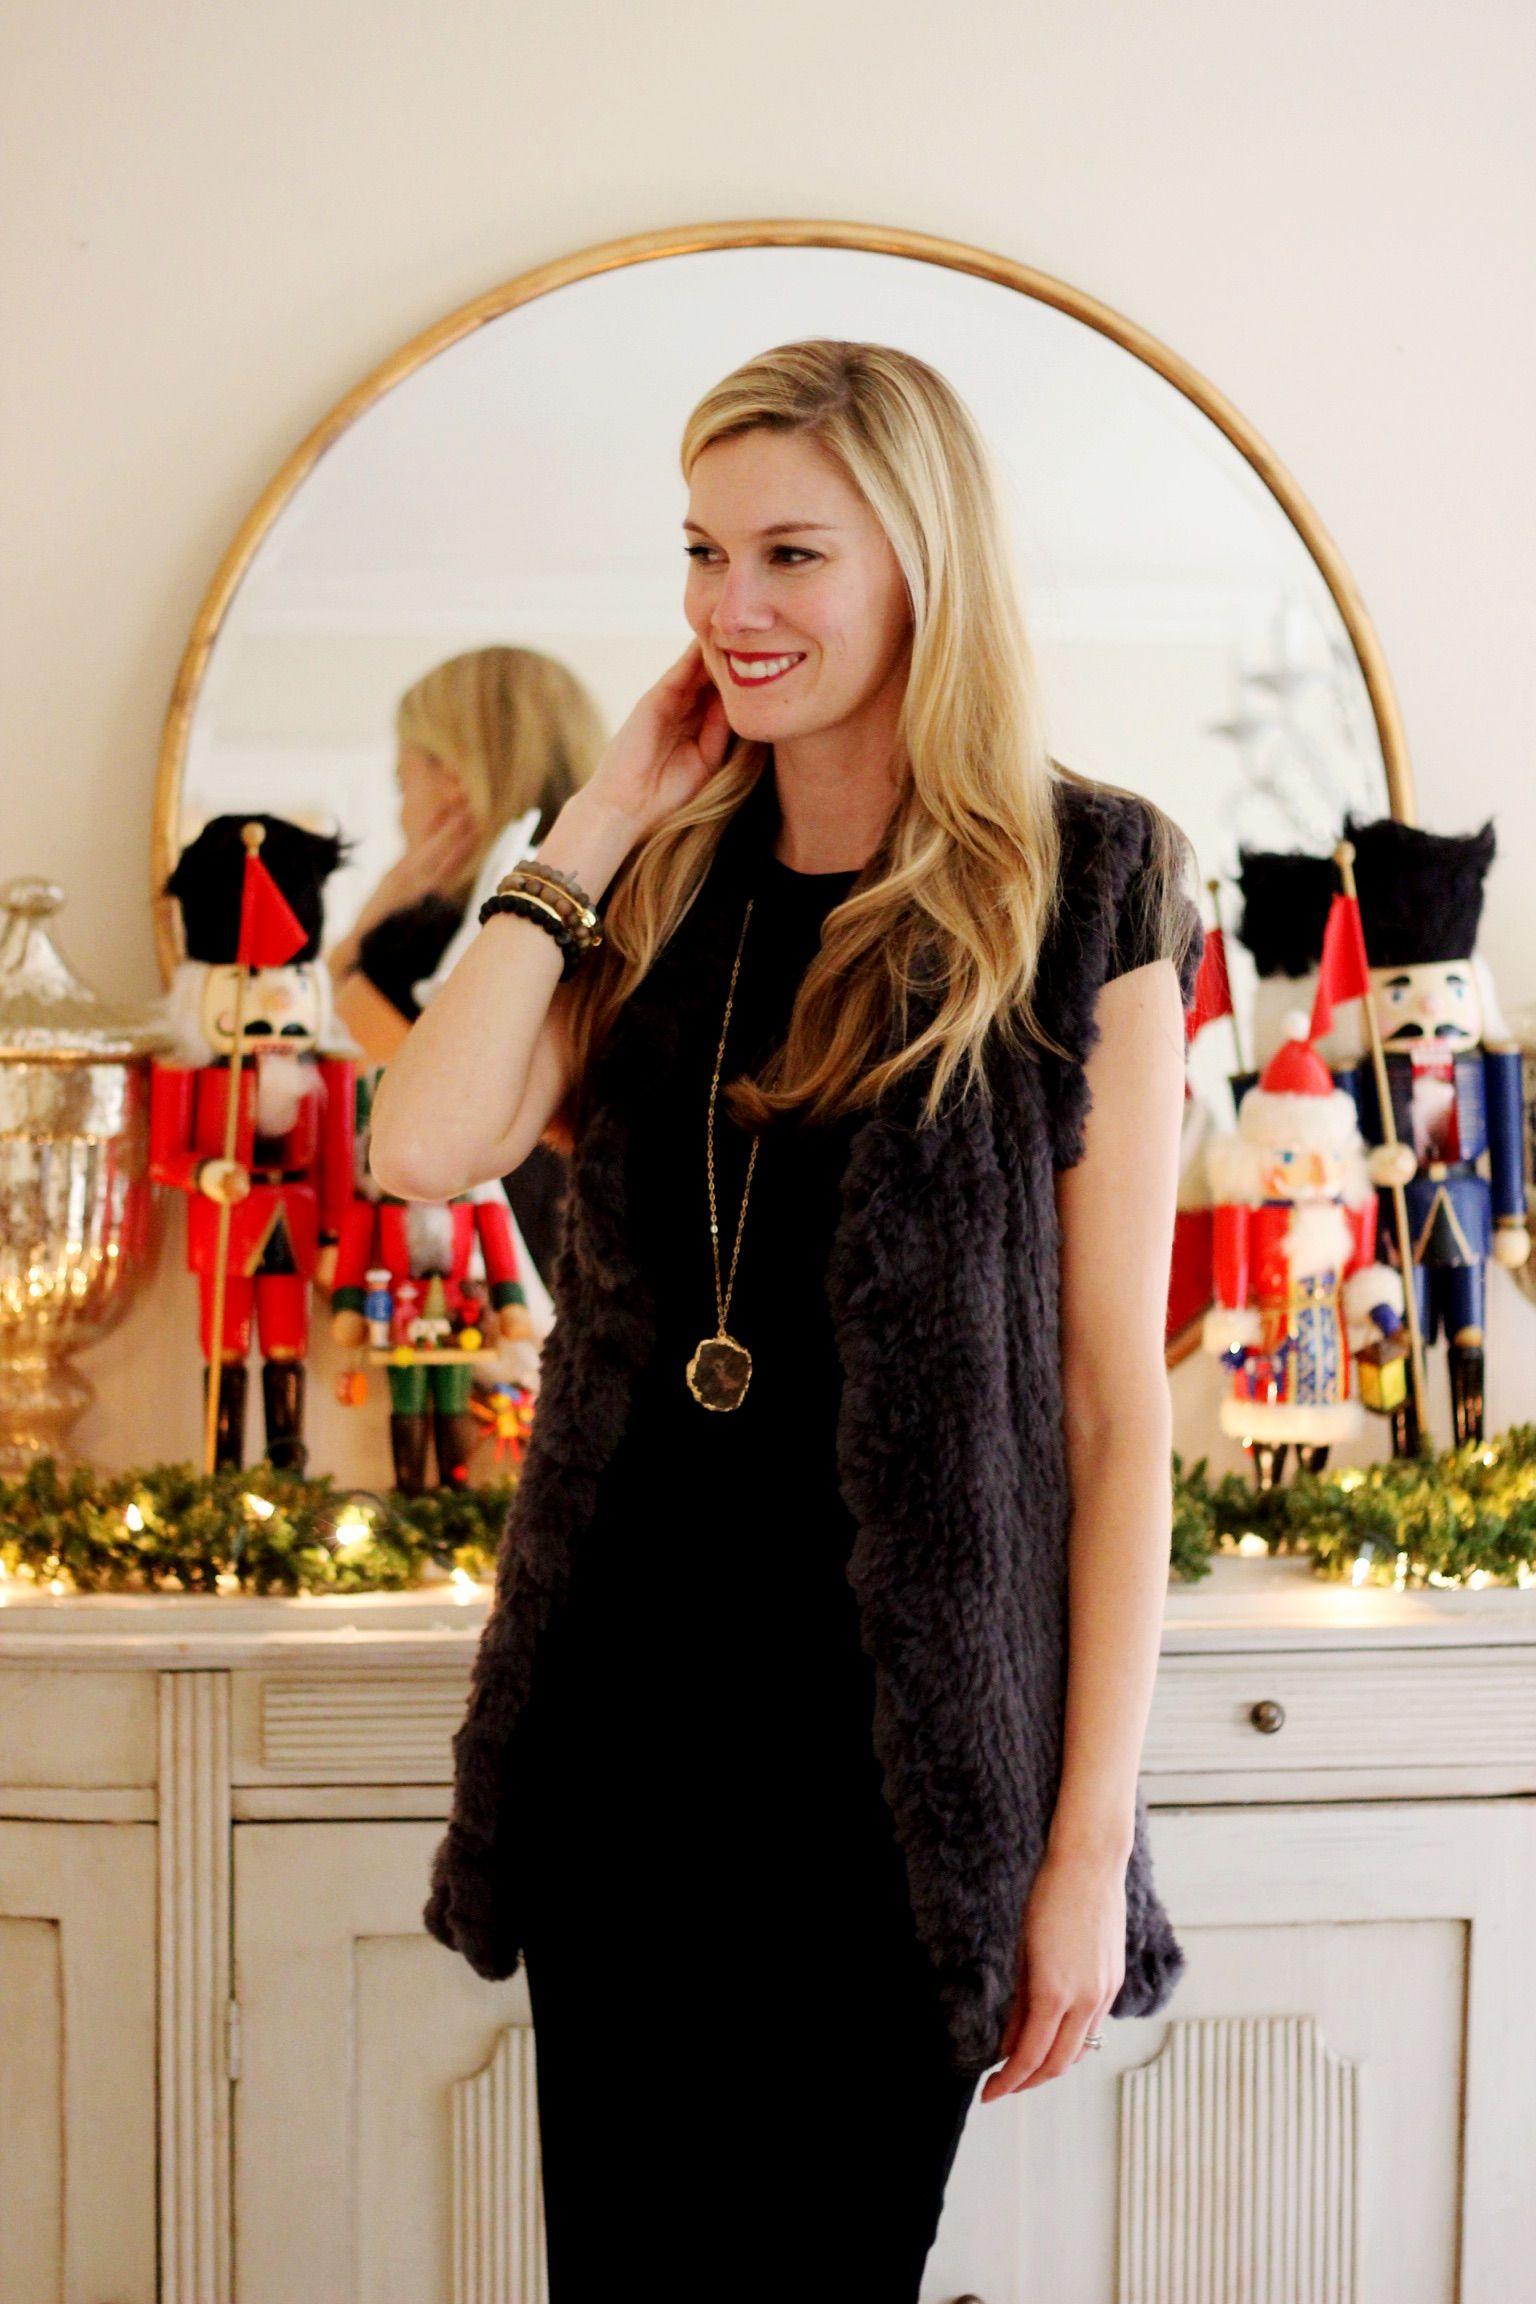 da1ddbe1493 C.Style Blog  Holiday Dress Guide  1 Dress